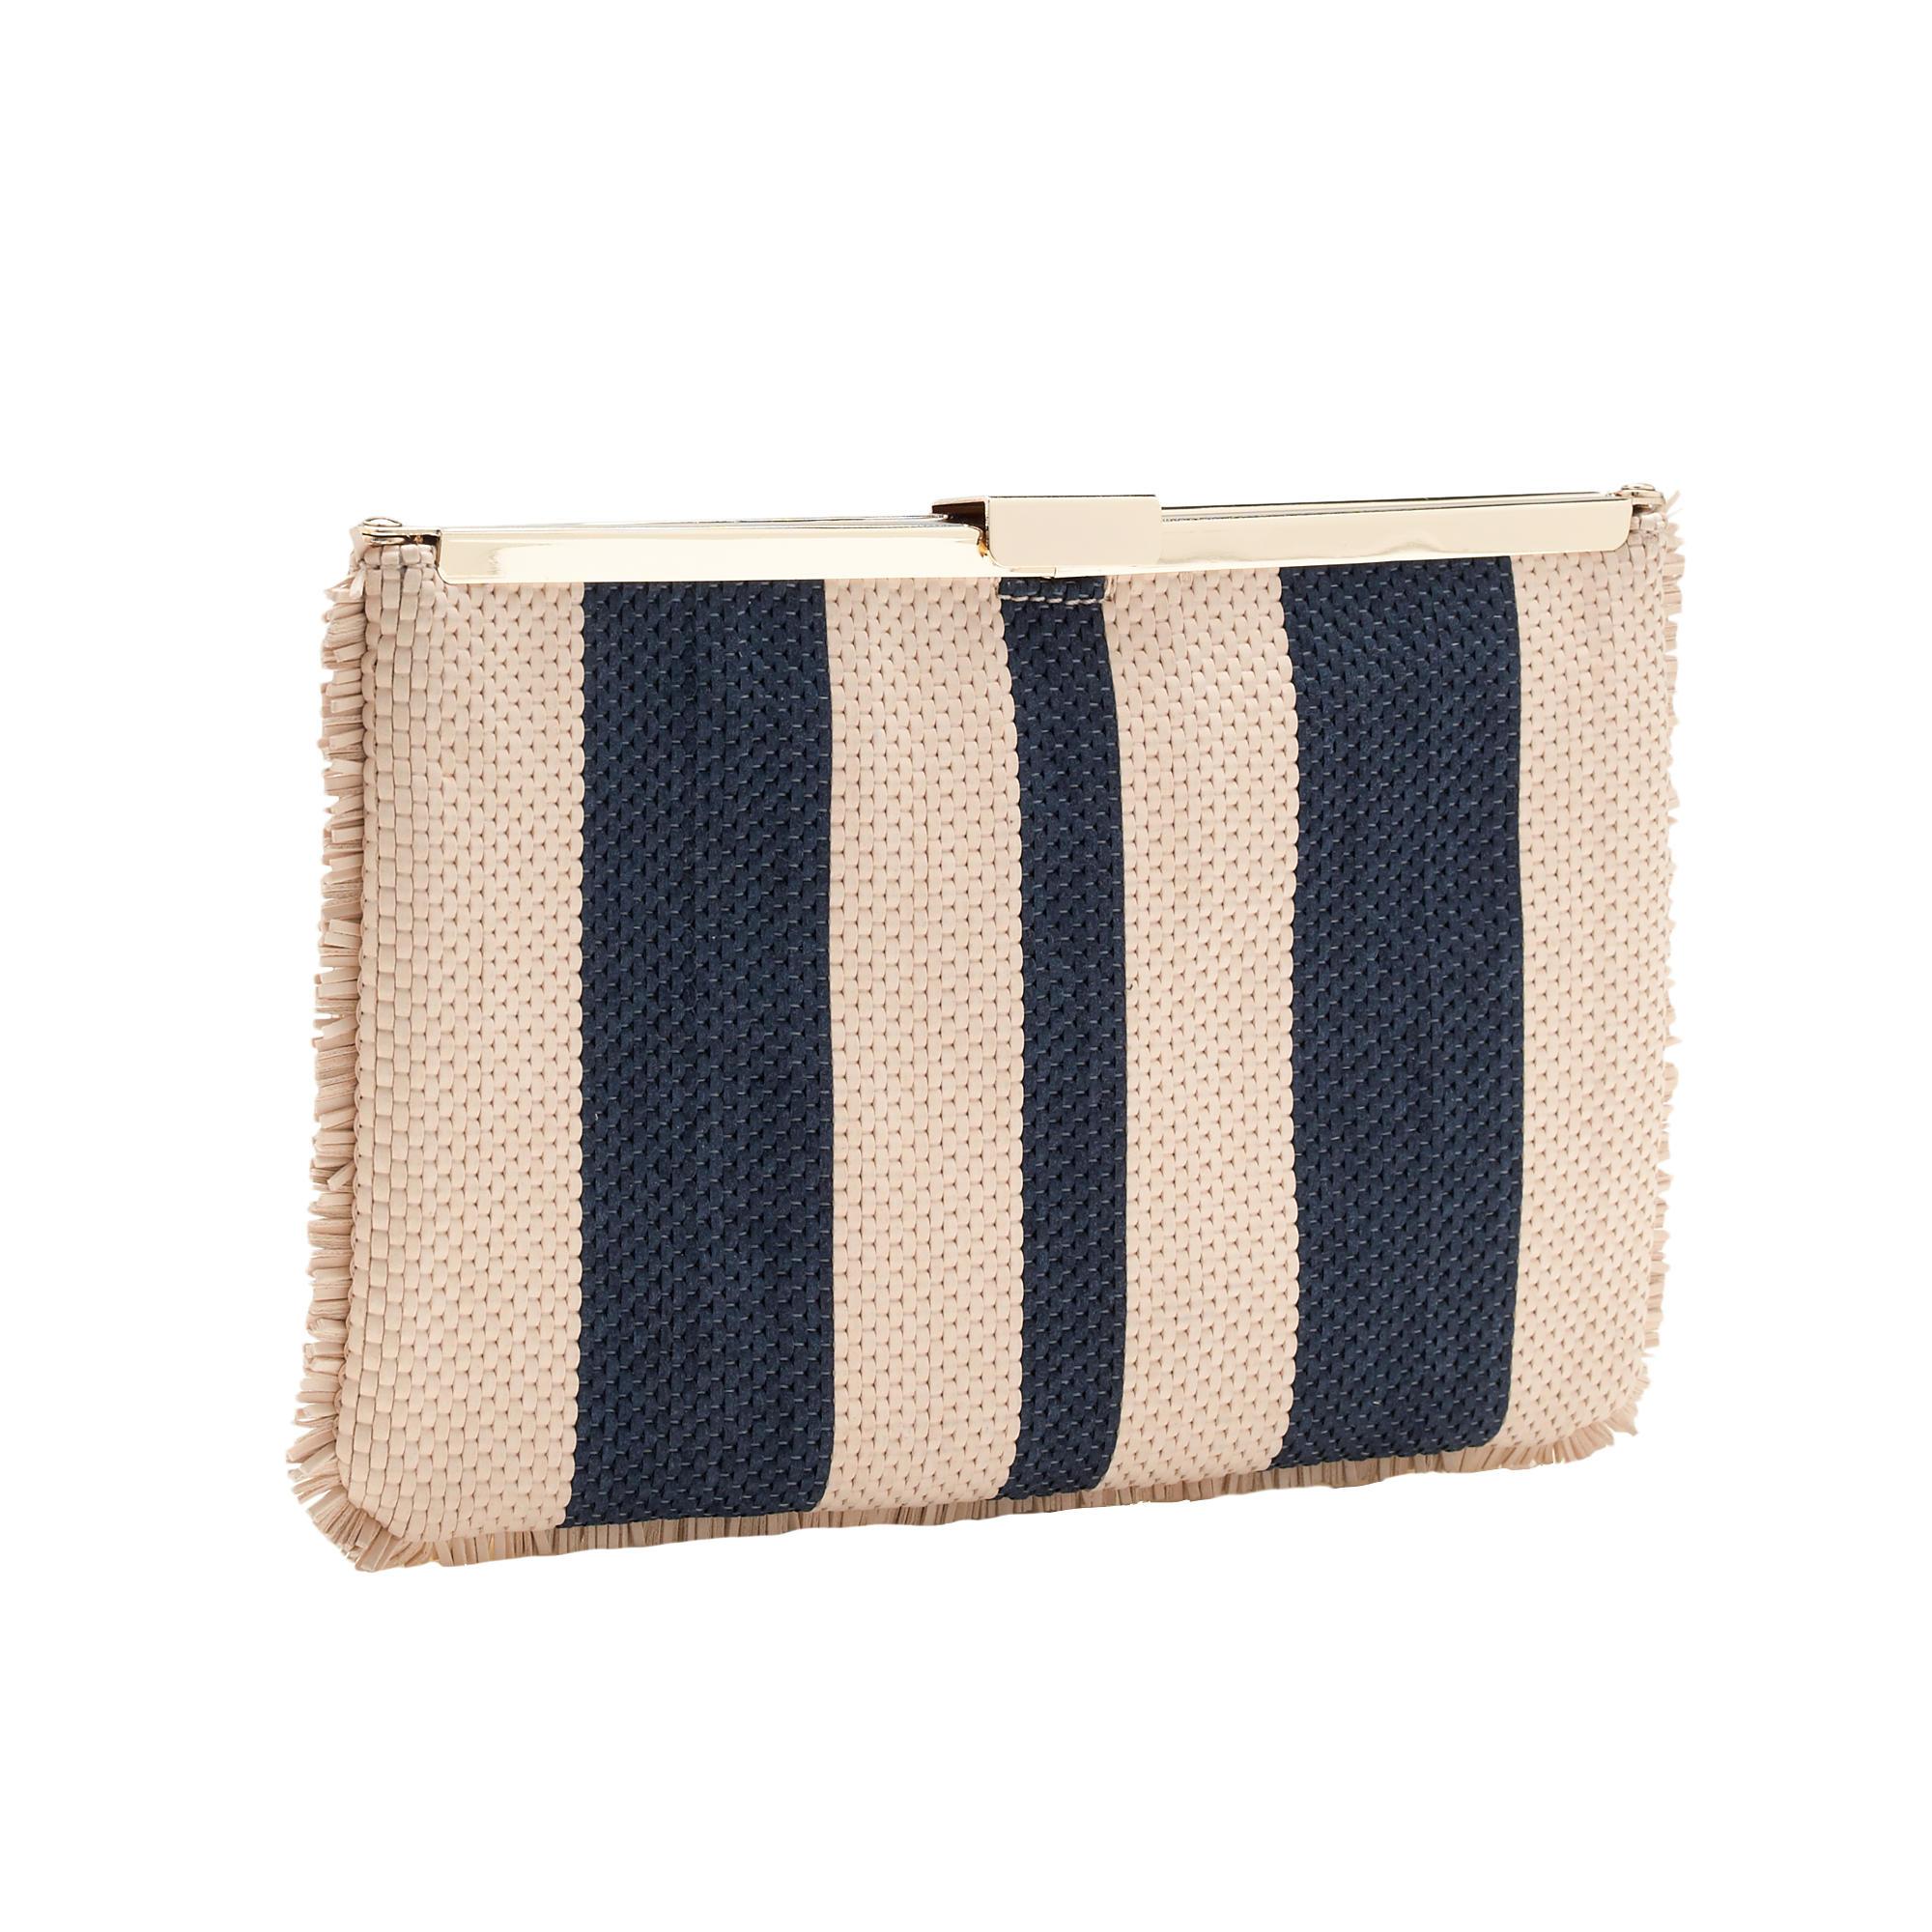 prada black fringe bag - J.crew Woven Striped Clutch in Blue (natural navy) | Lyst